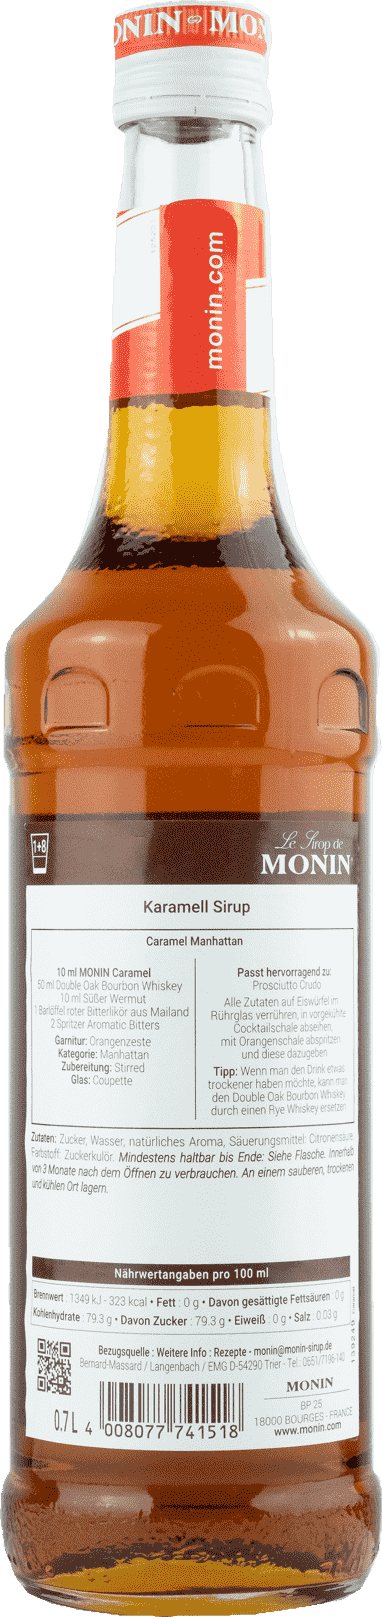 Monin Sirup Caramel 0,7l Karamell